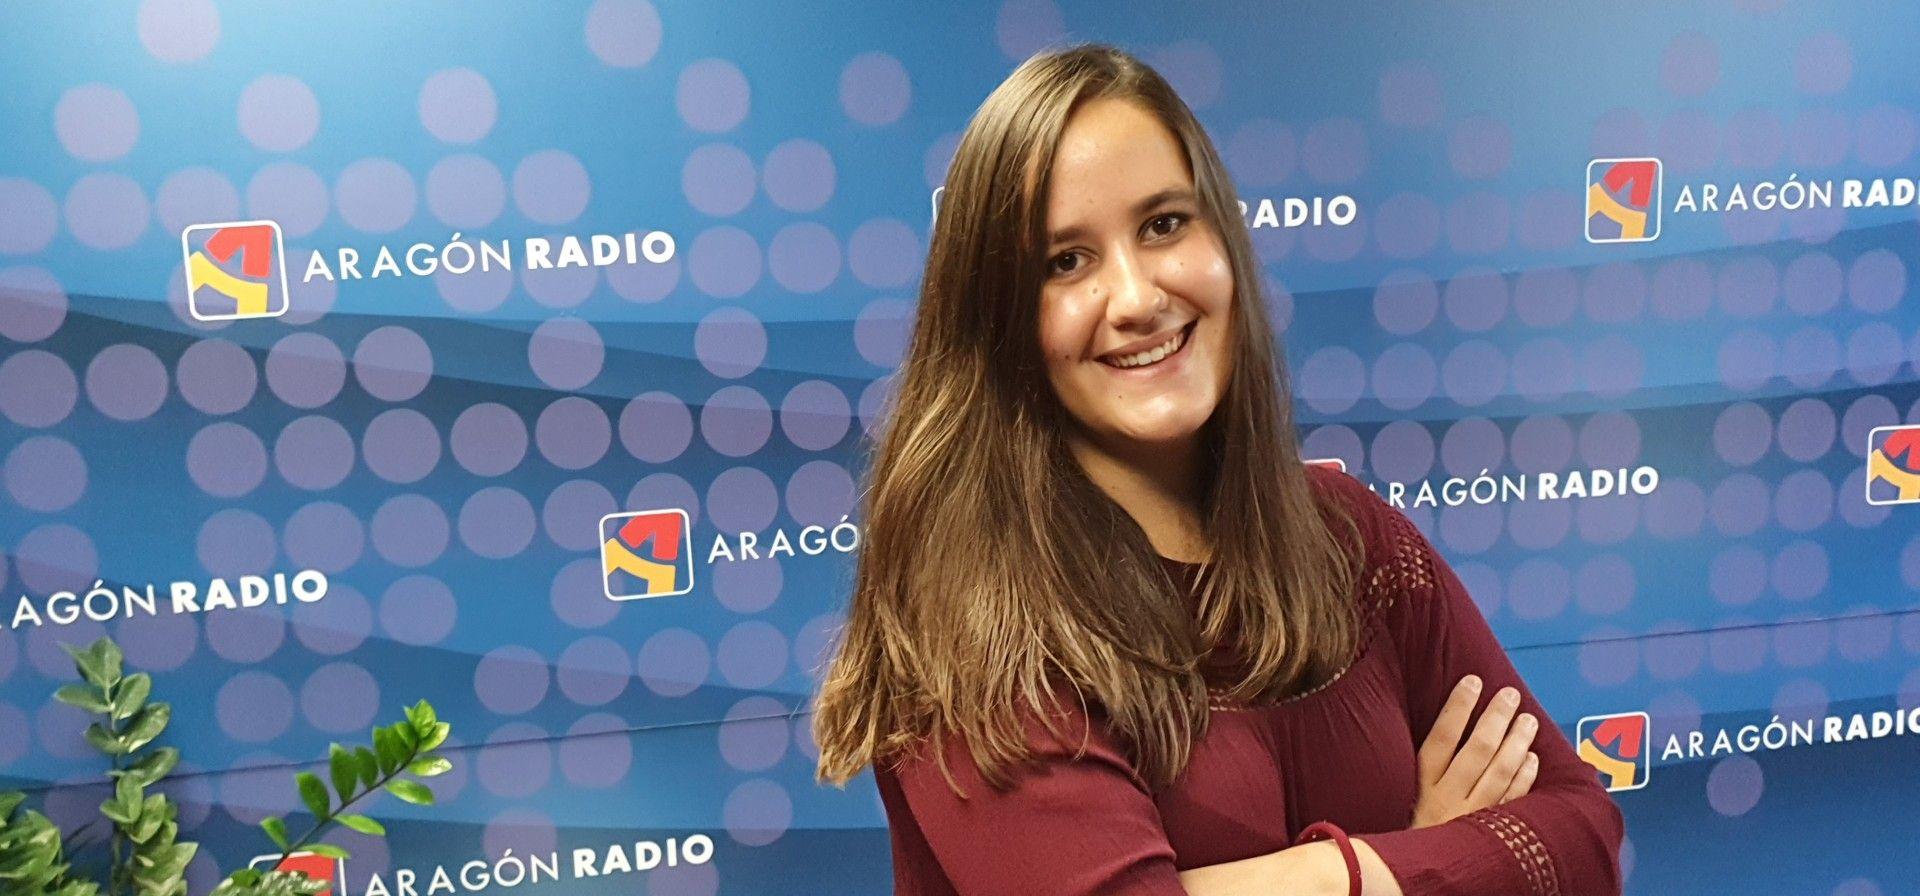 aragon-radio-contigo